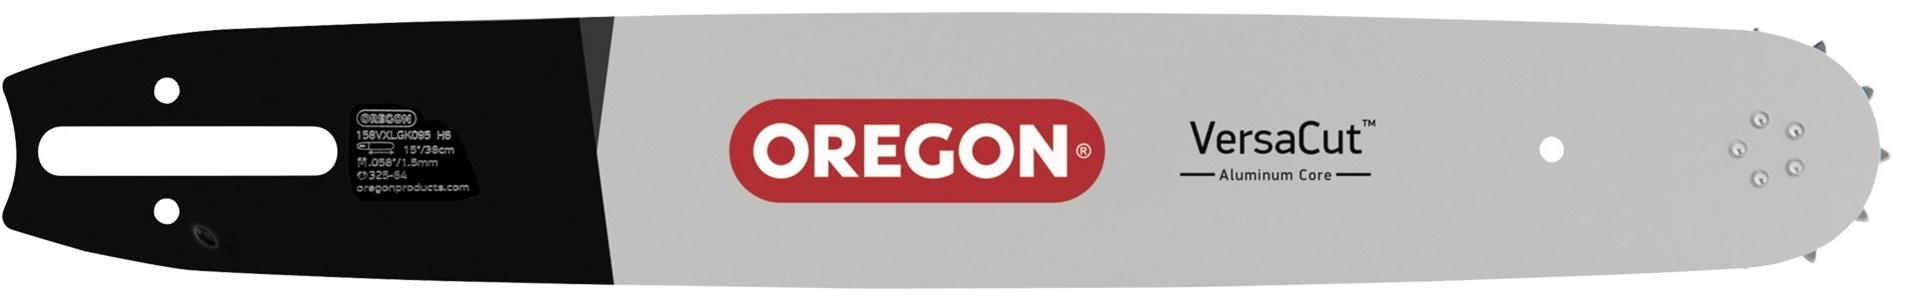 Oregon VersaCut vezető